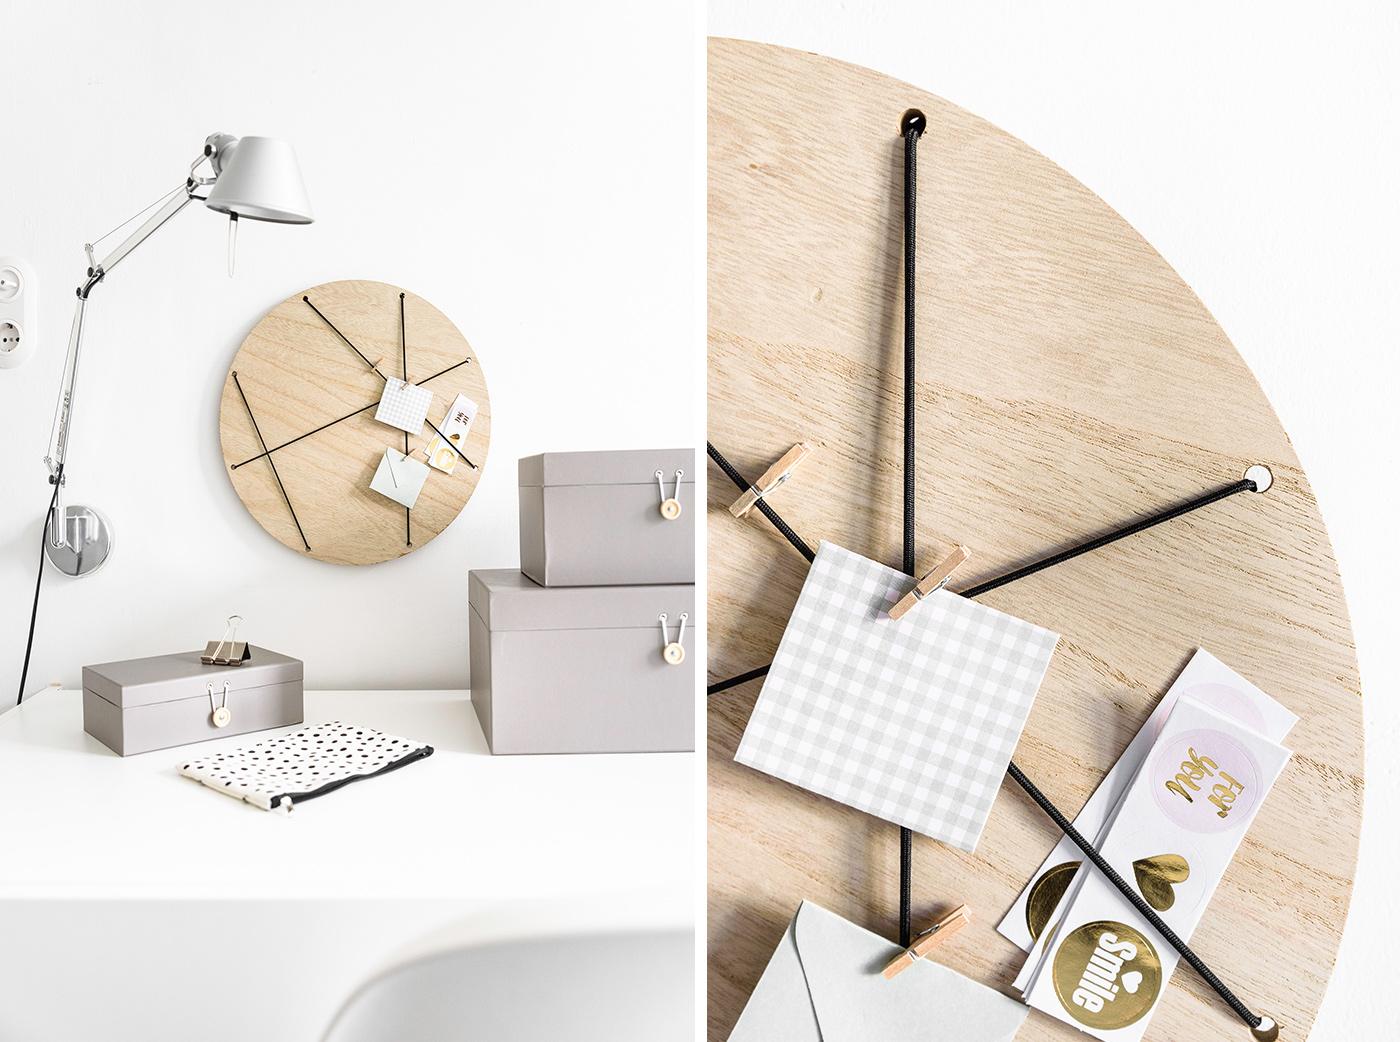 Pimp my desk - Homeoffice mit DIY Pinnwand